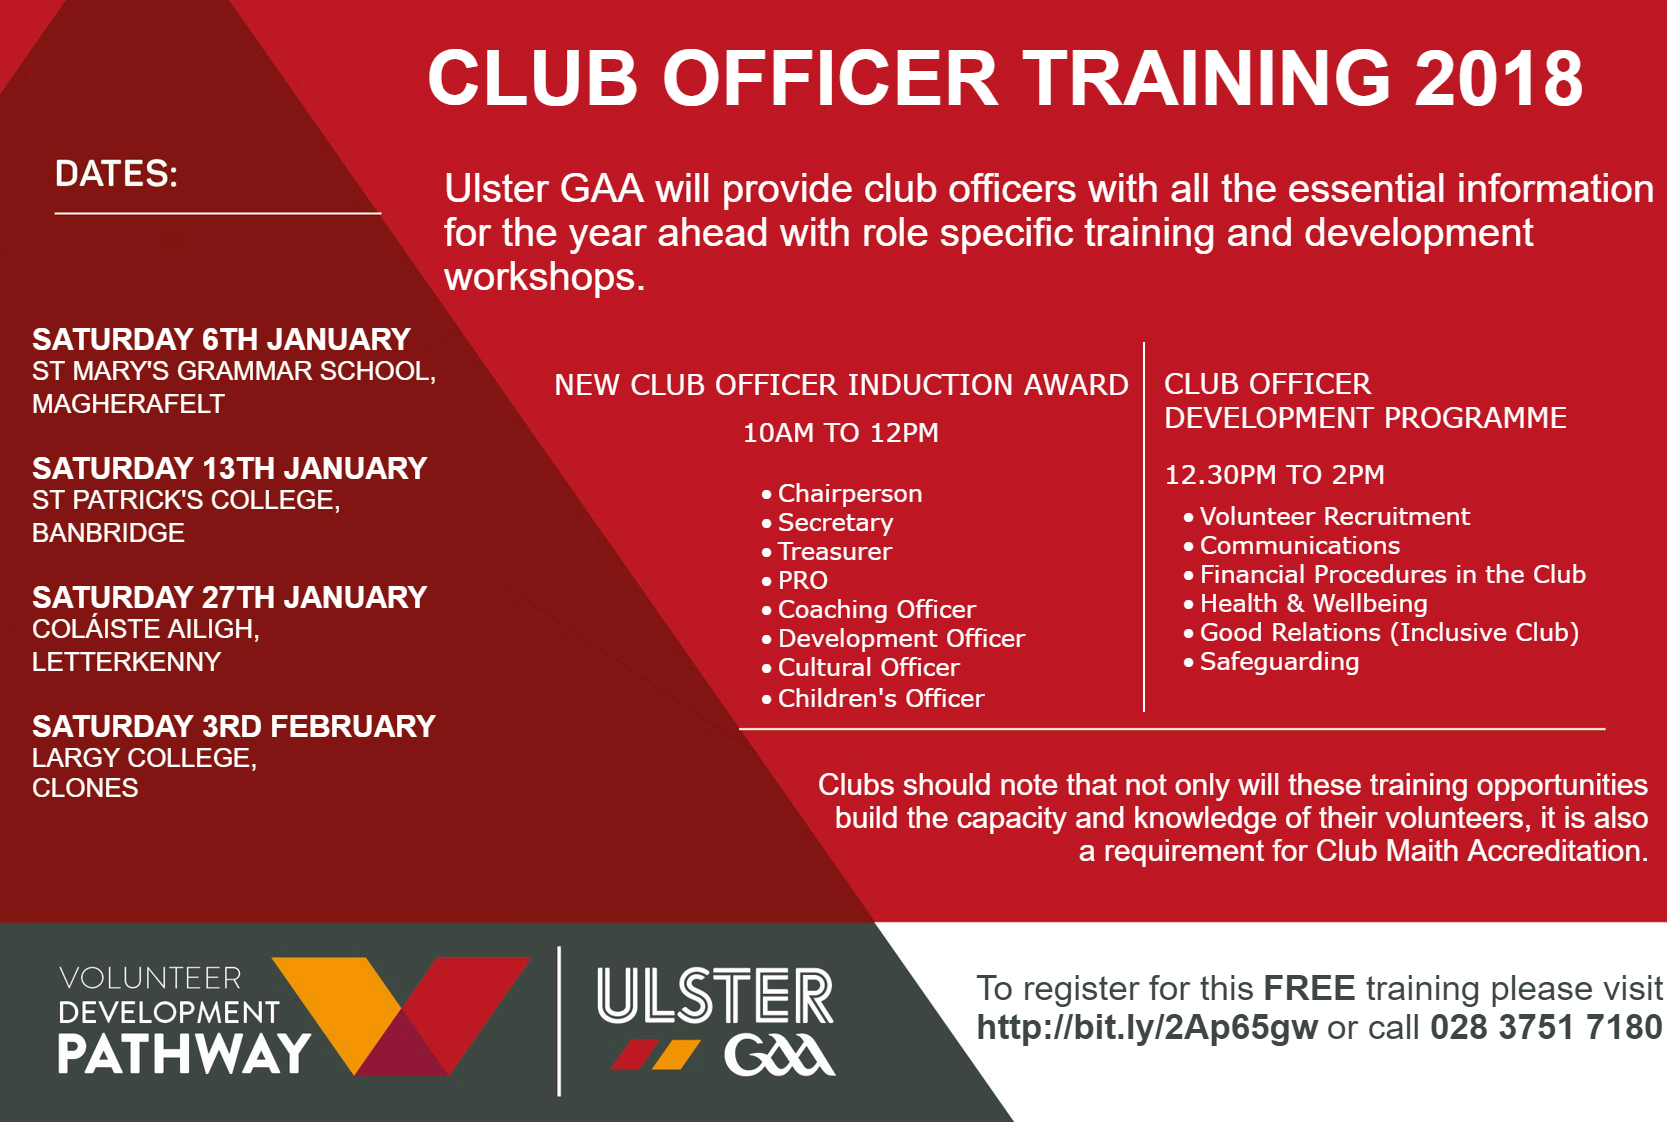 Ulster GAA Club Officer Training 2018